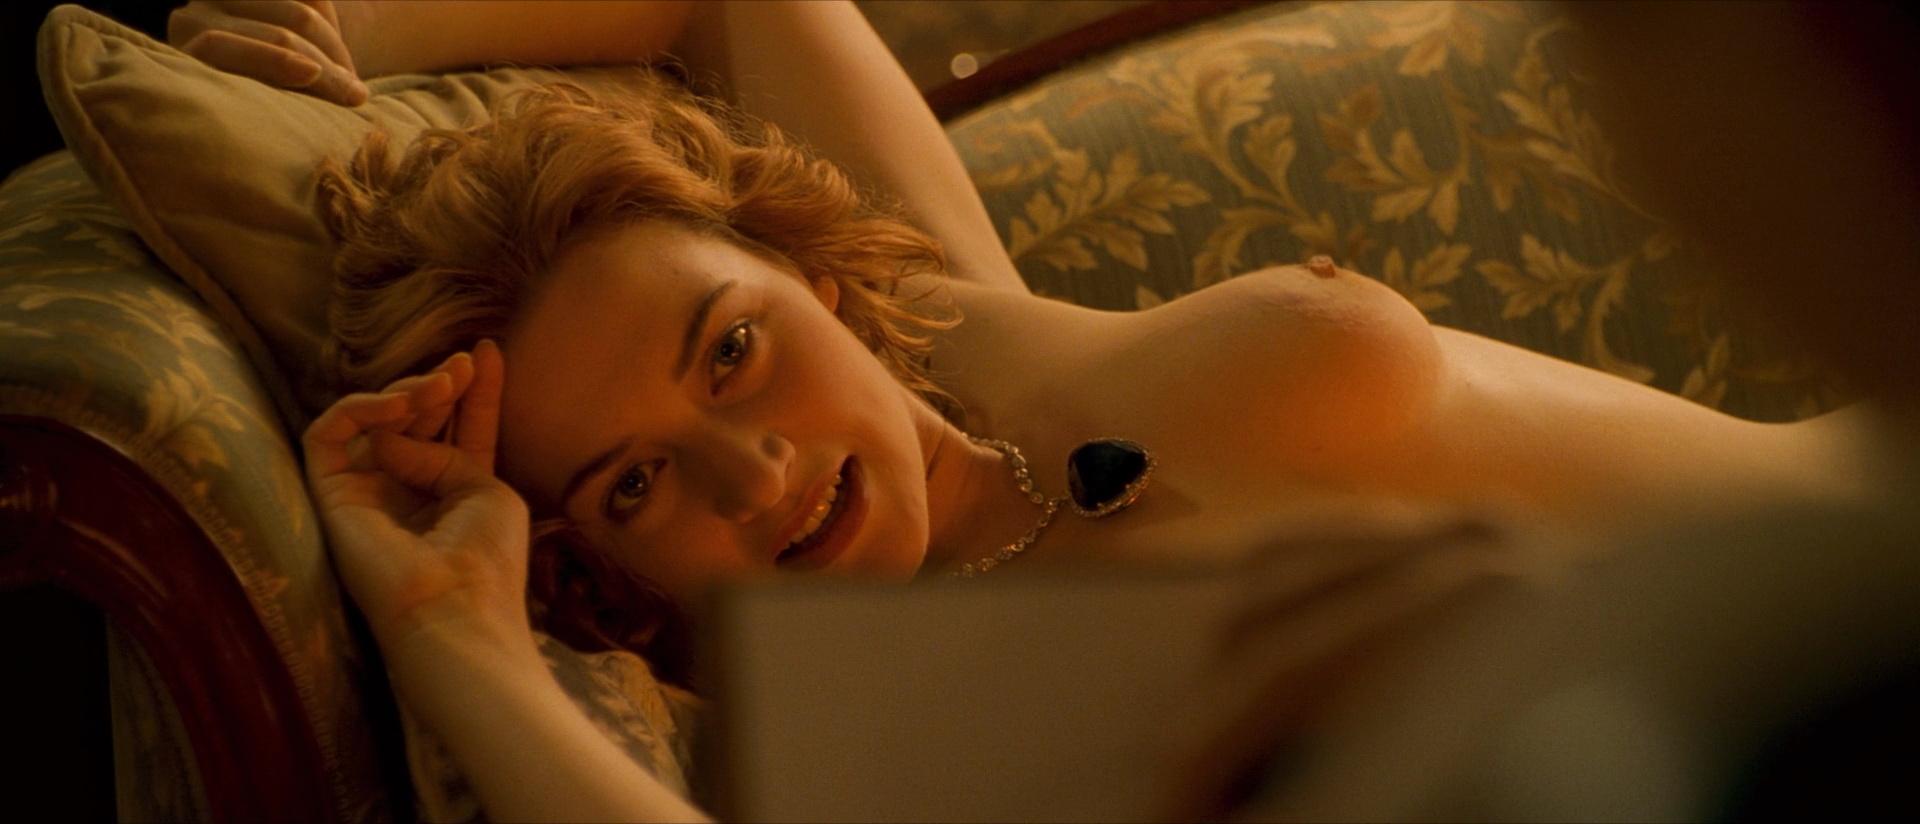 Janice porn star